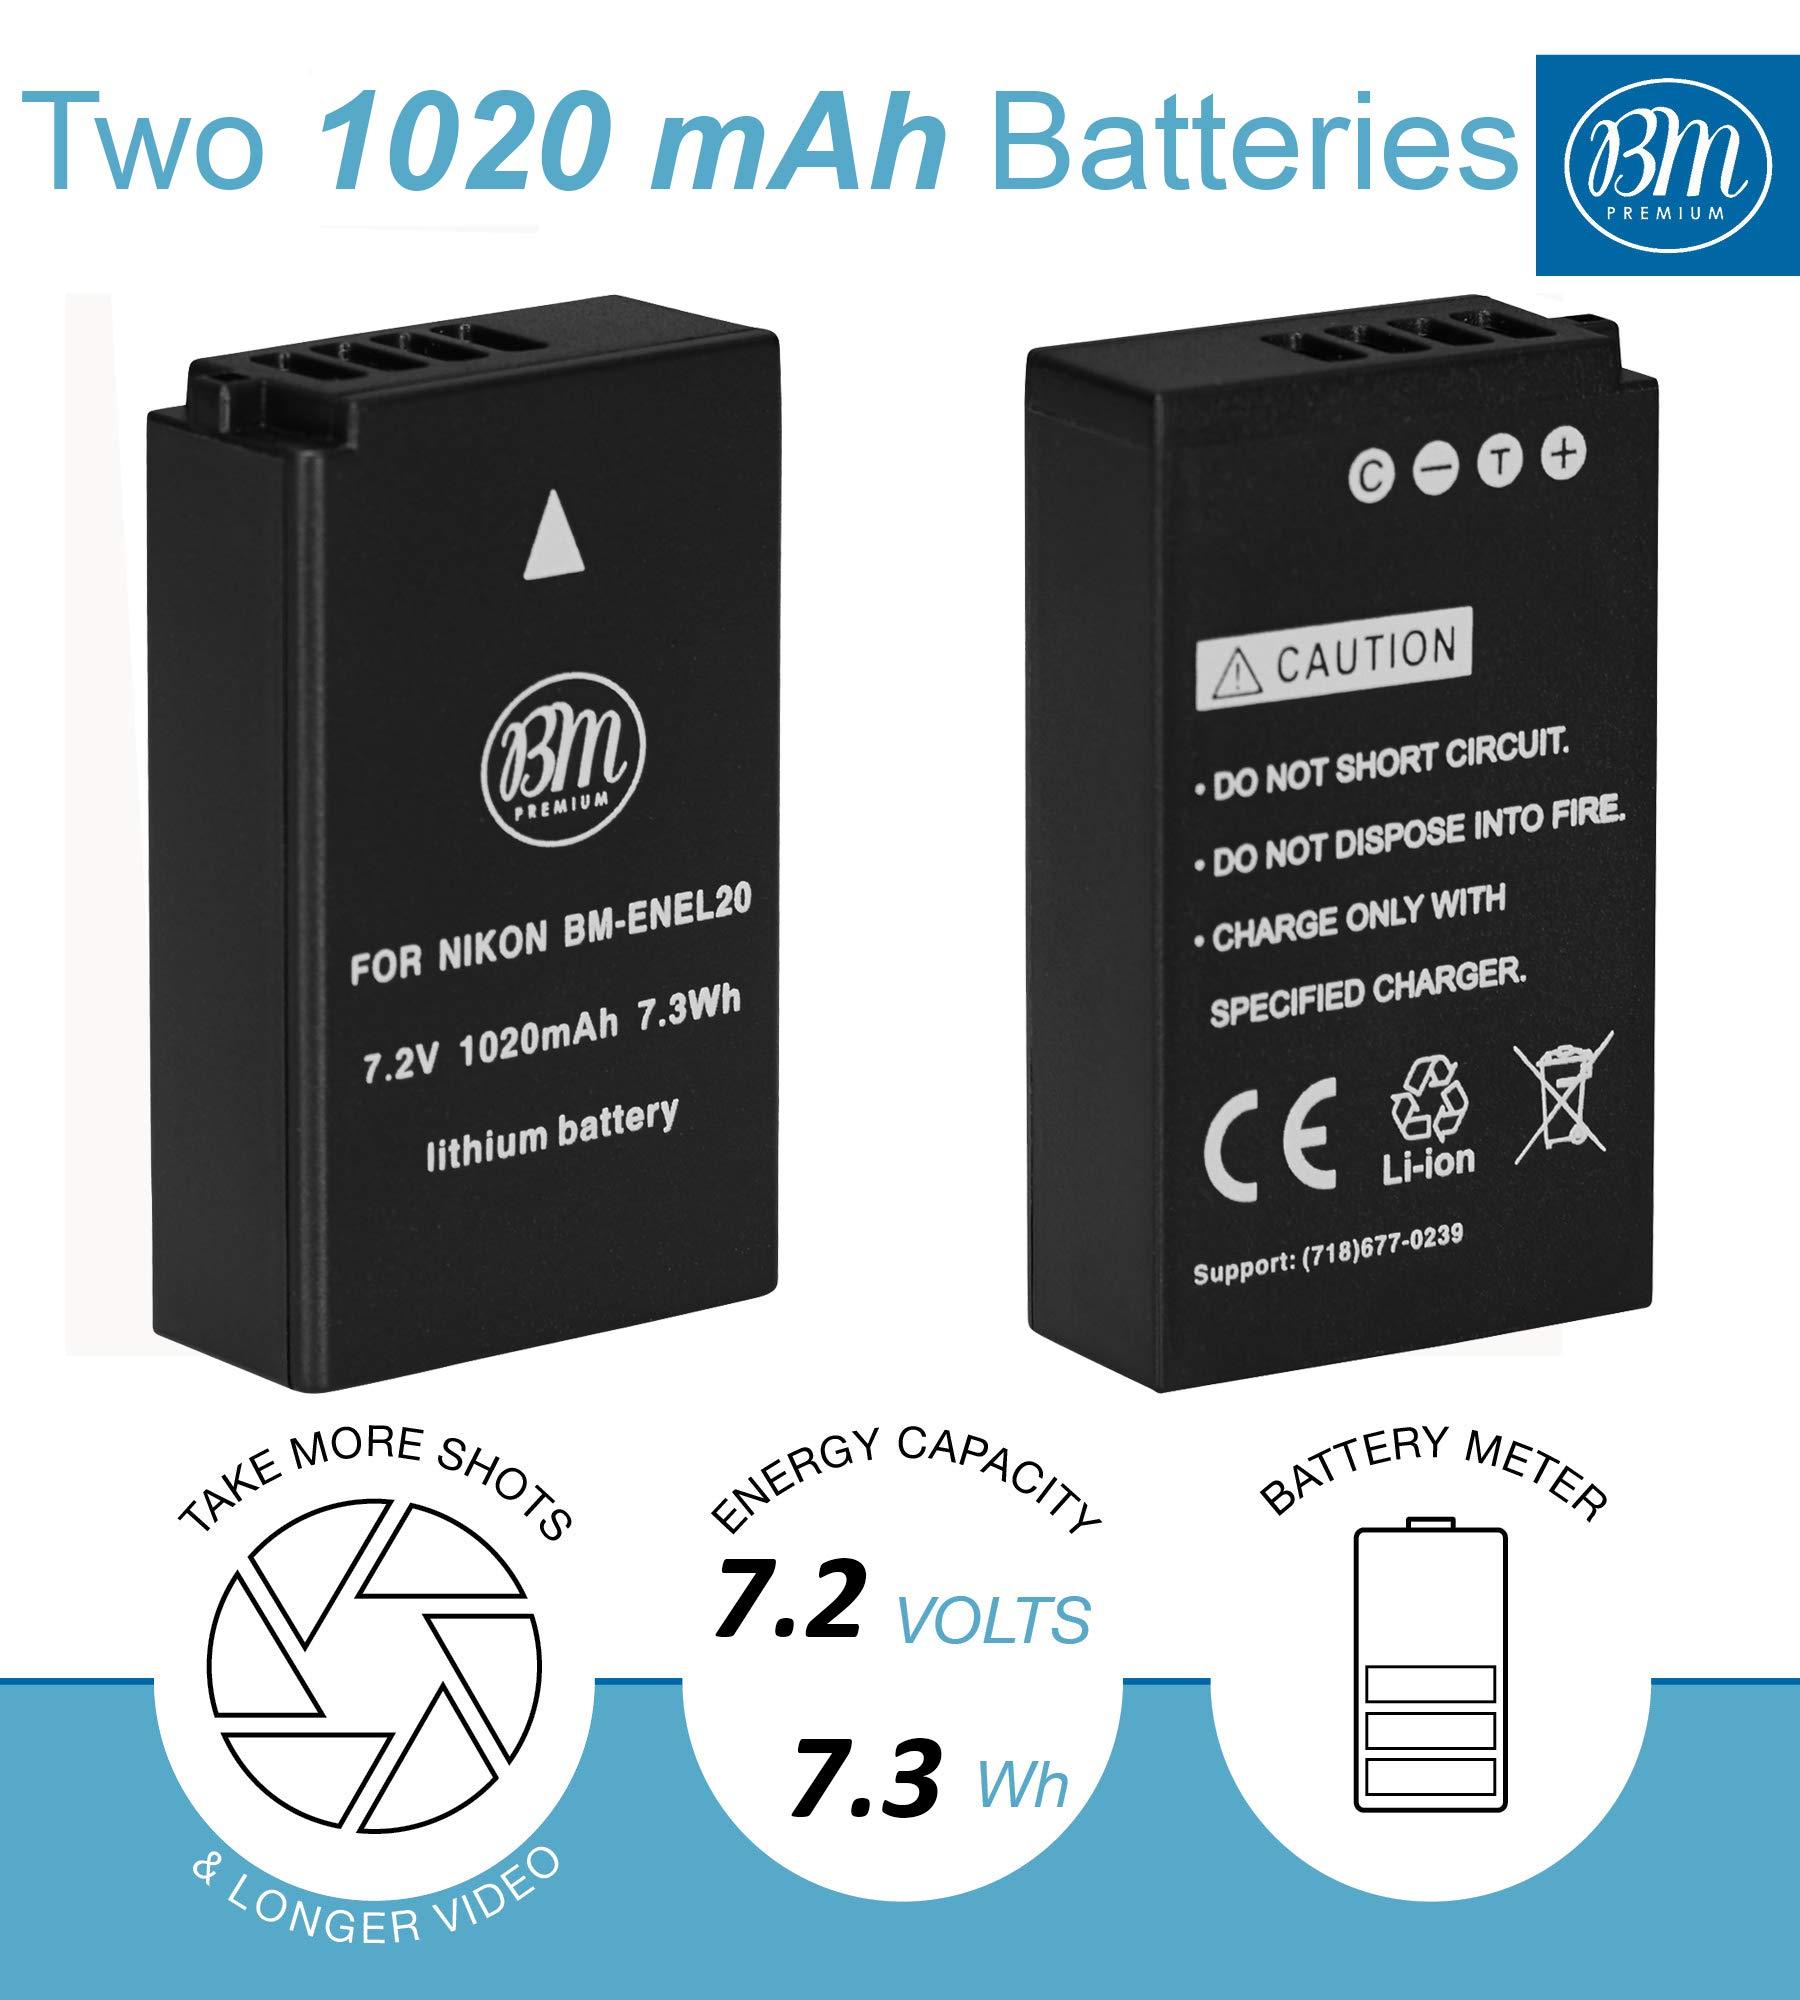 Quality Camera Battery charger for Nikon EN-EL20 Coolpix A Nikon J1 J2 J3 S1 V3